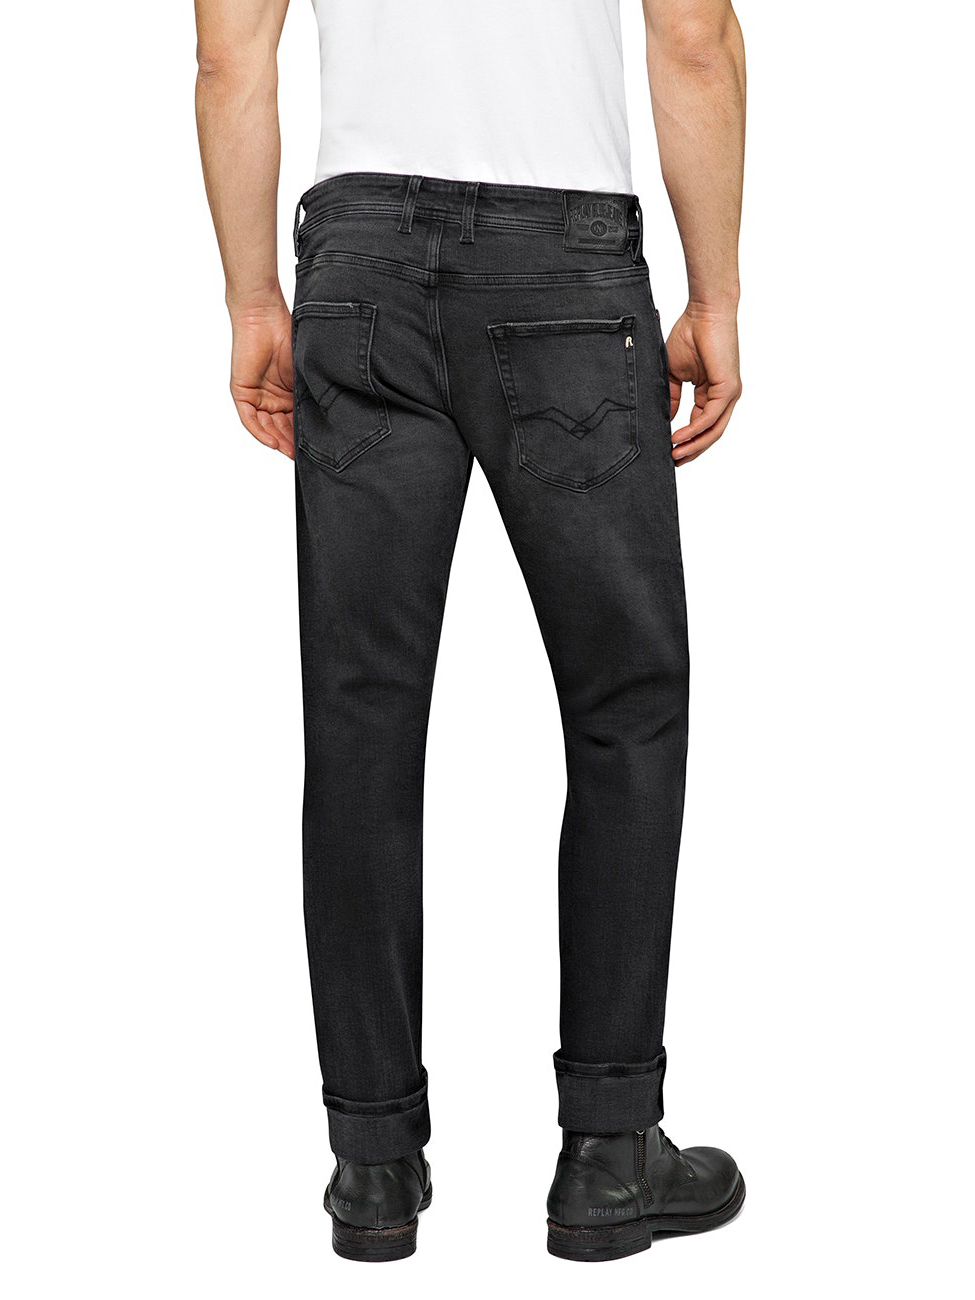 replay-herren-jeans-grover-straight-fit-slim-leg-schwarz-black